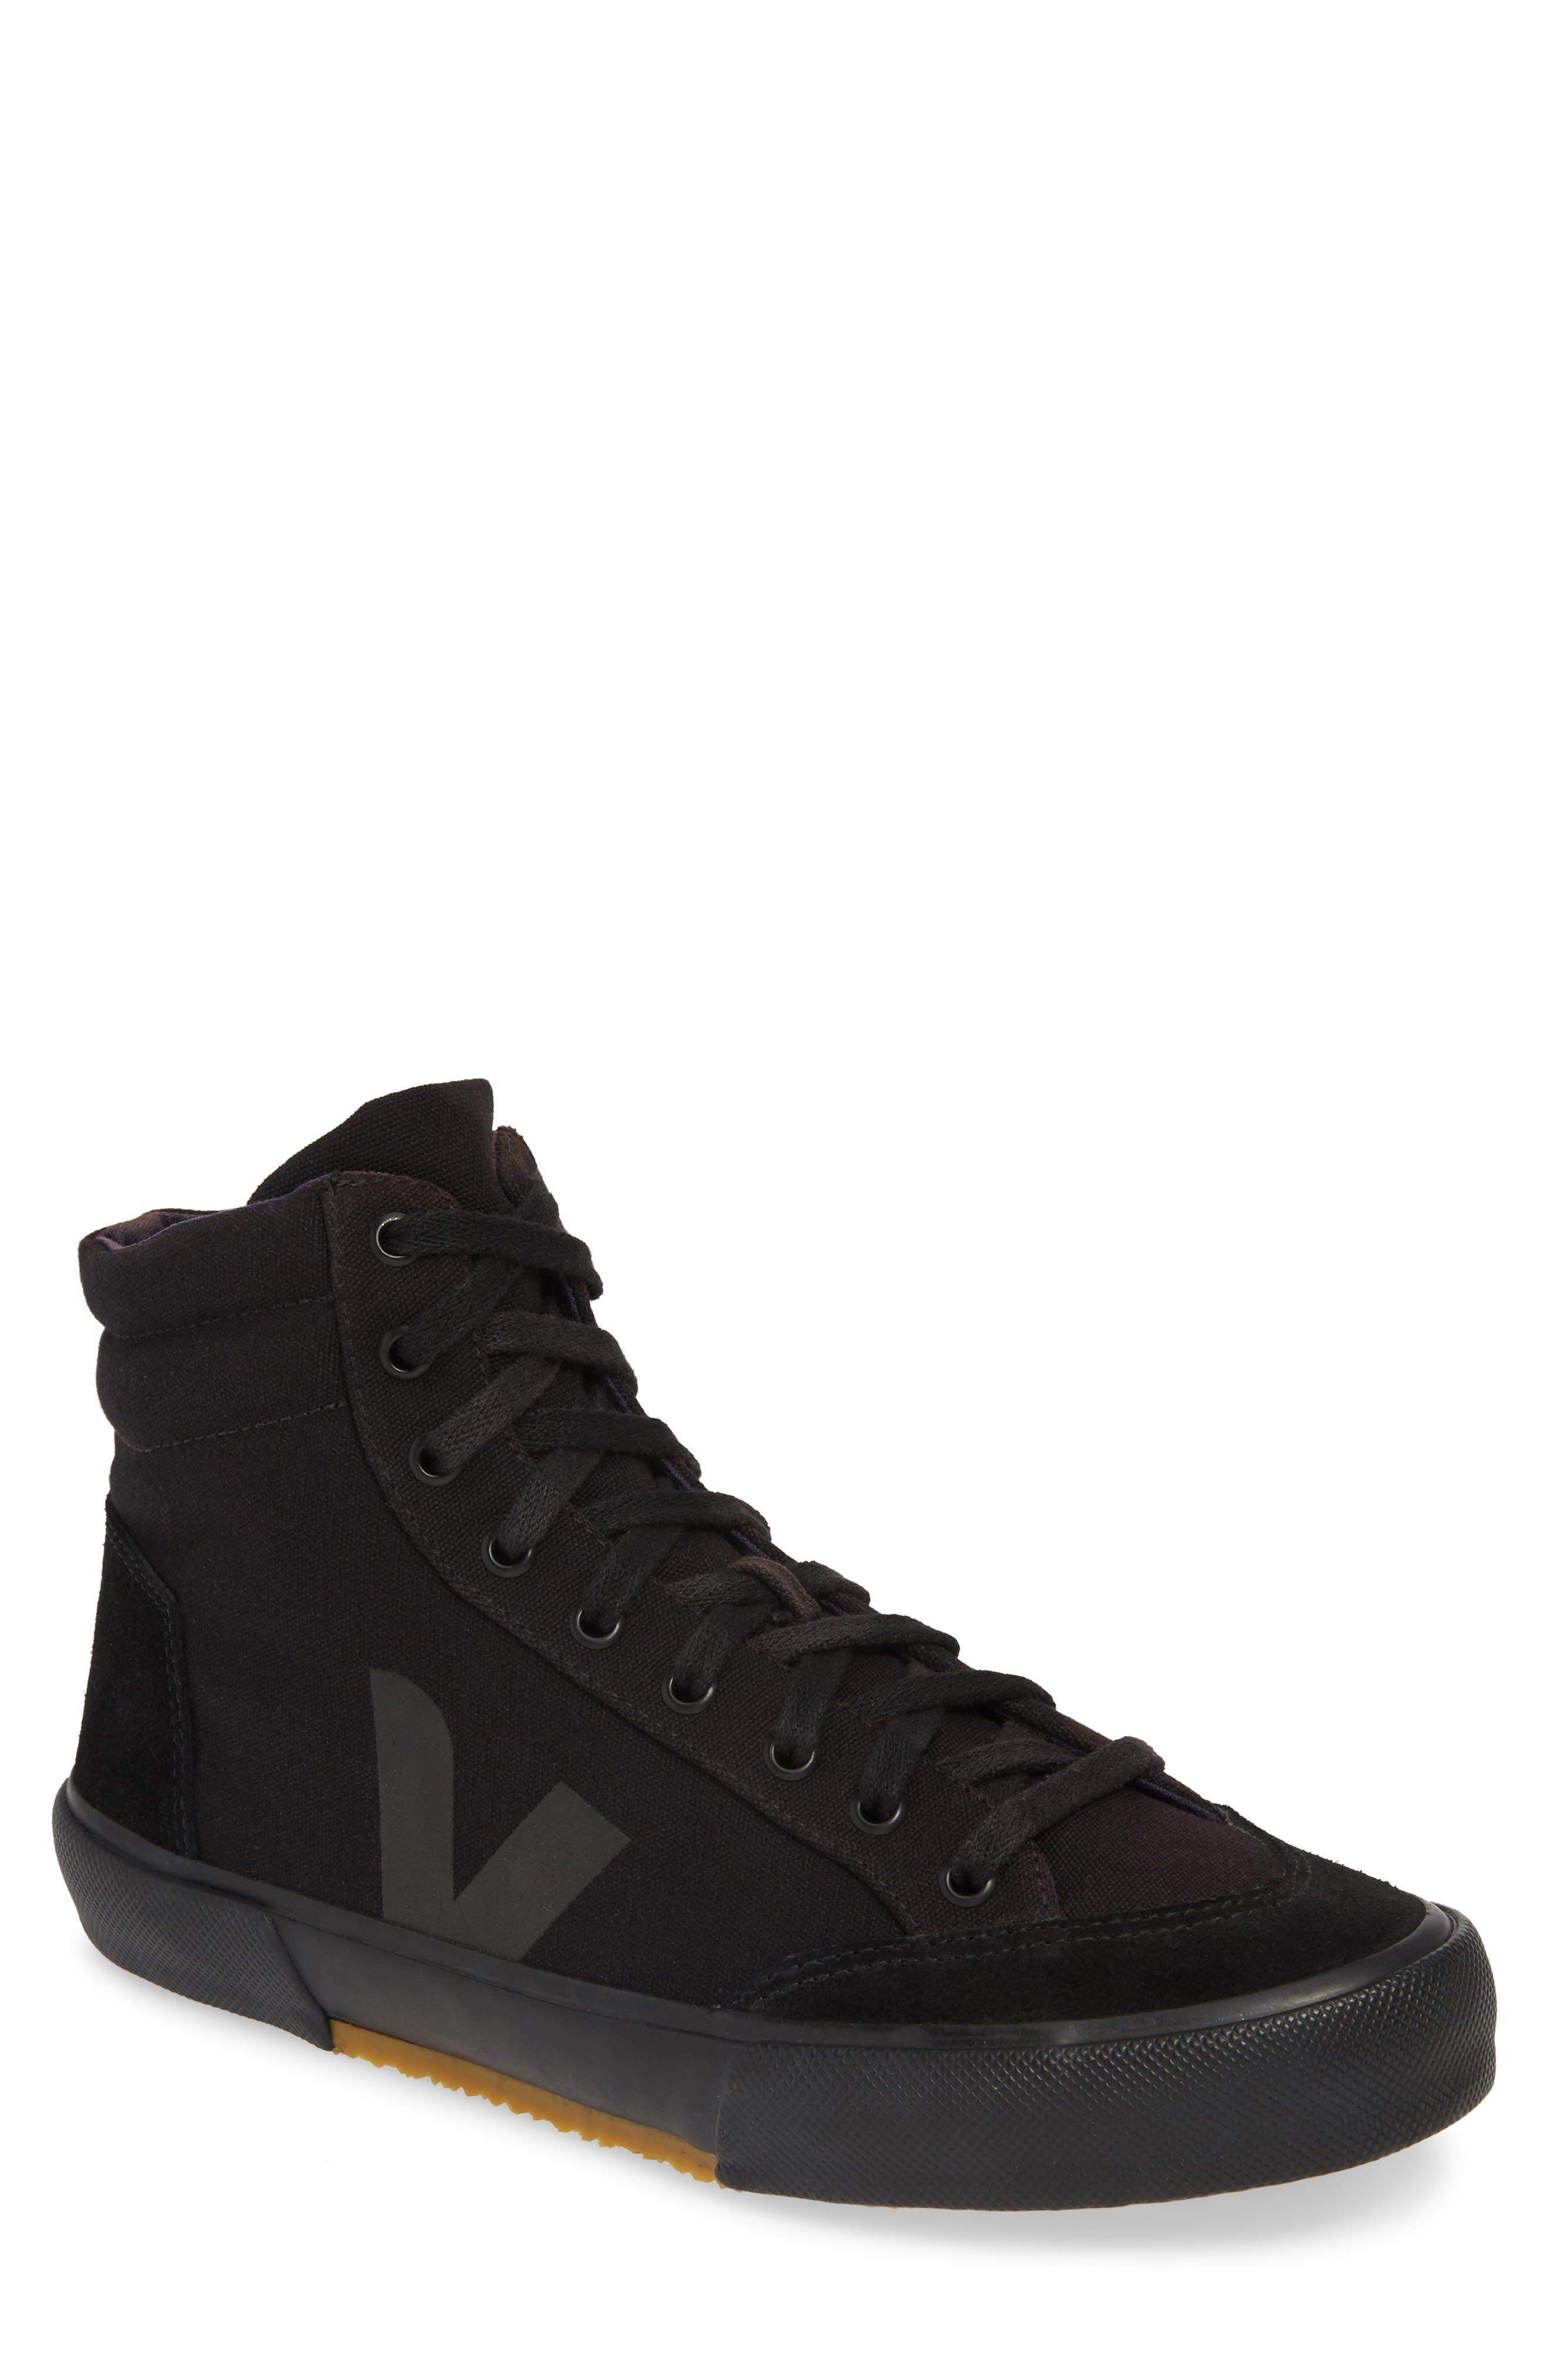 Veja X Lemaire Sneaker, Black